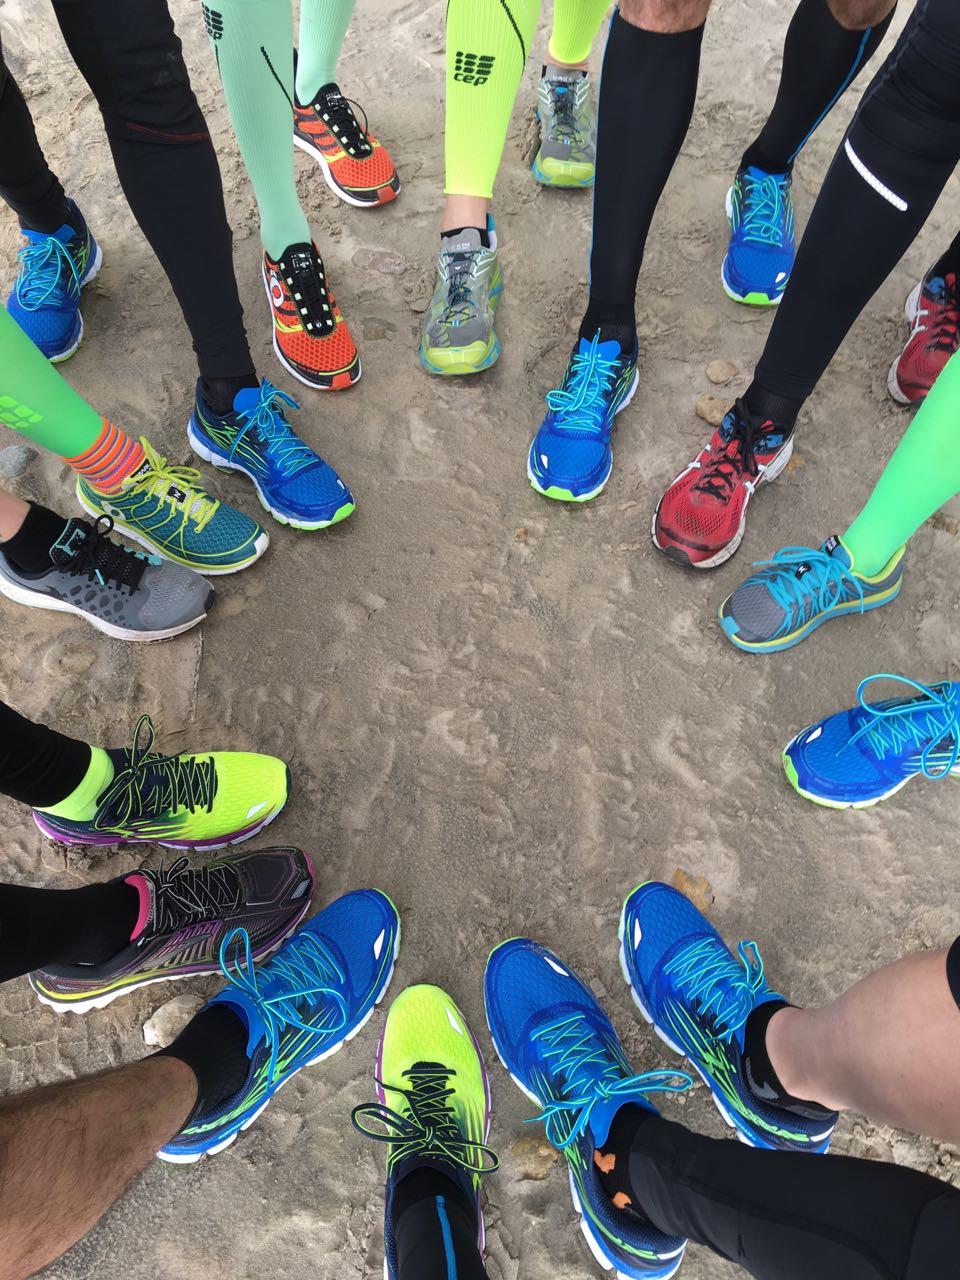 Sports & Diagnostic Lauftreff - Wöchentlich in Maudach/LU